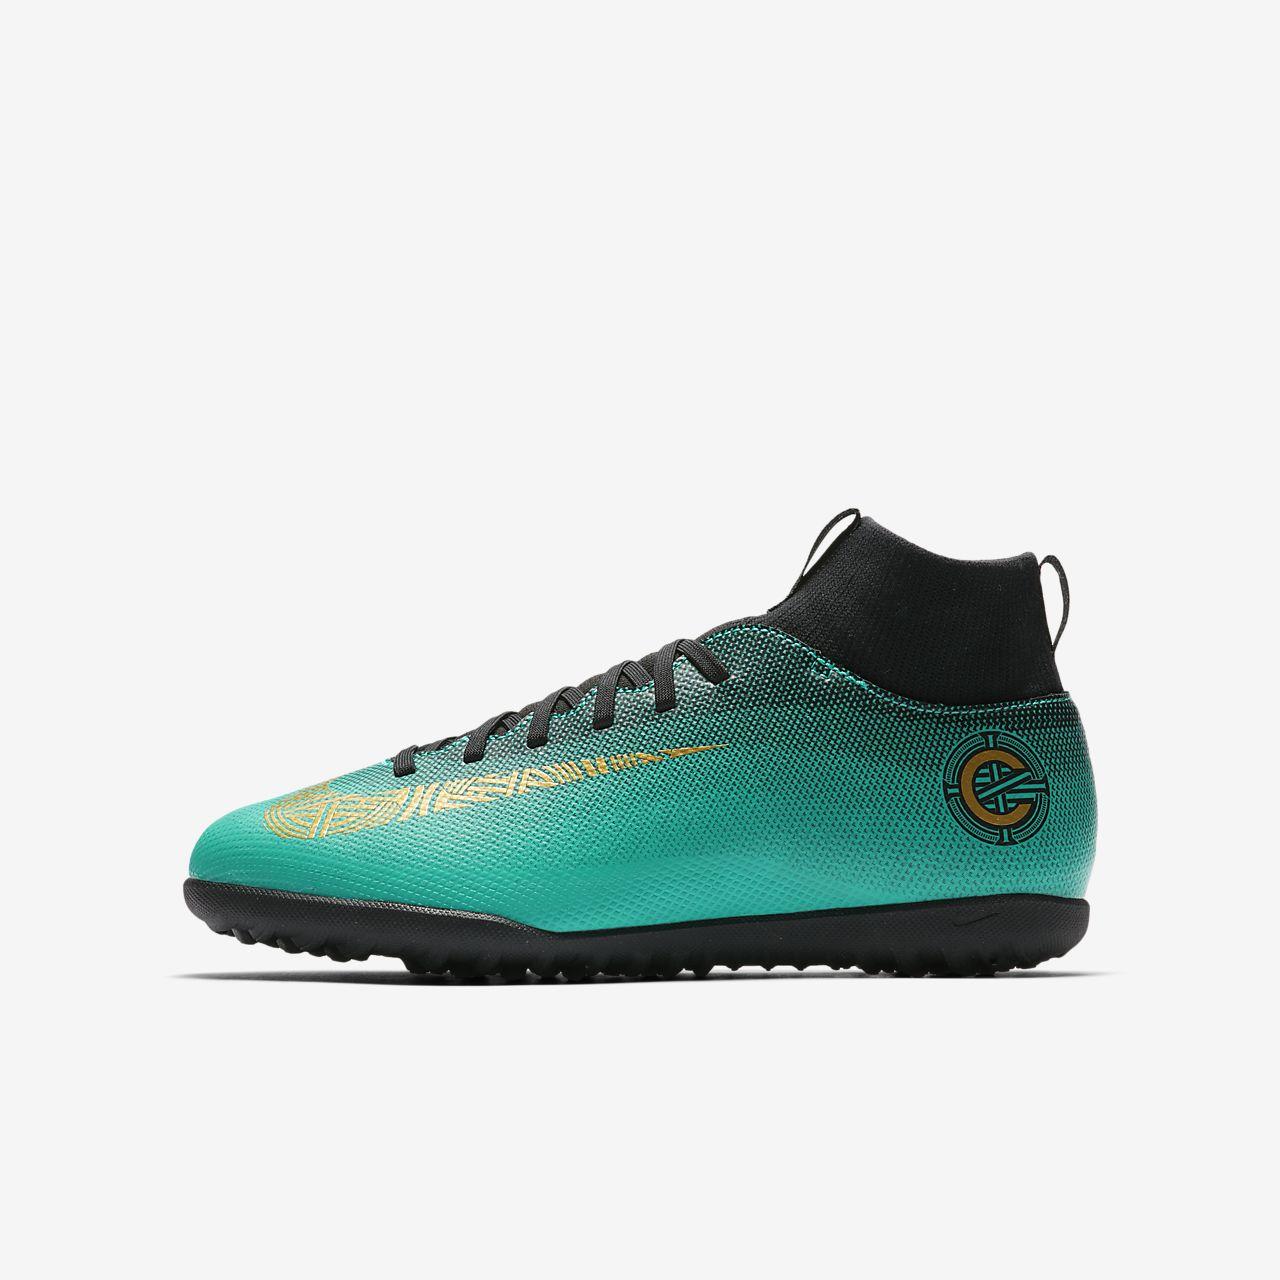 83950e13a731 Nike Jr. MercurialX Superfly VI Club CR7 TF Younger/Older Kids' Turf ...